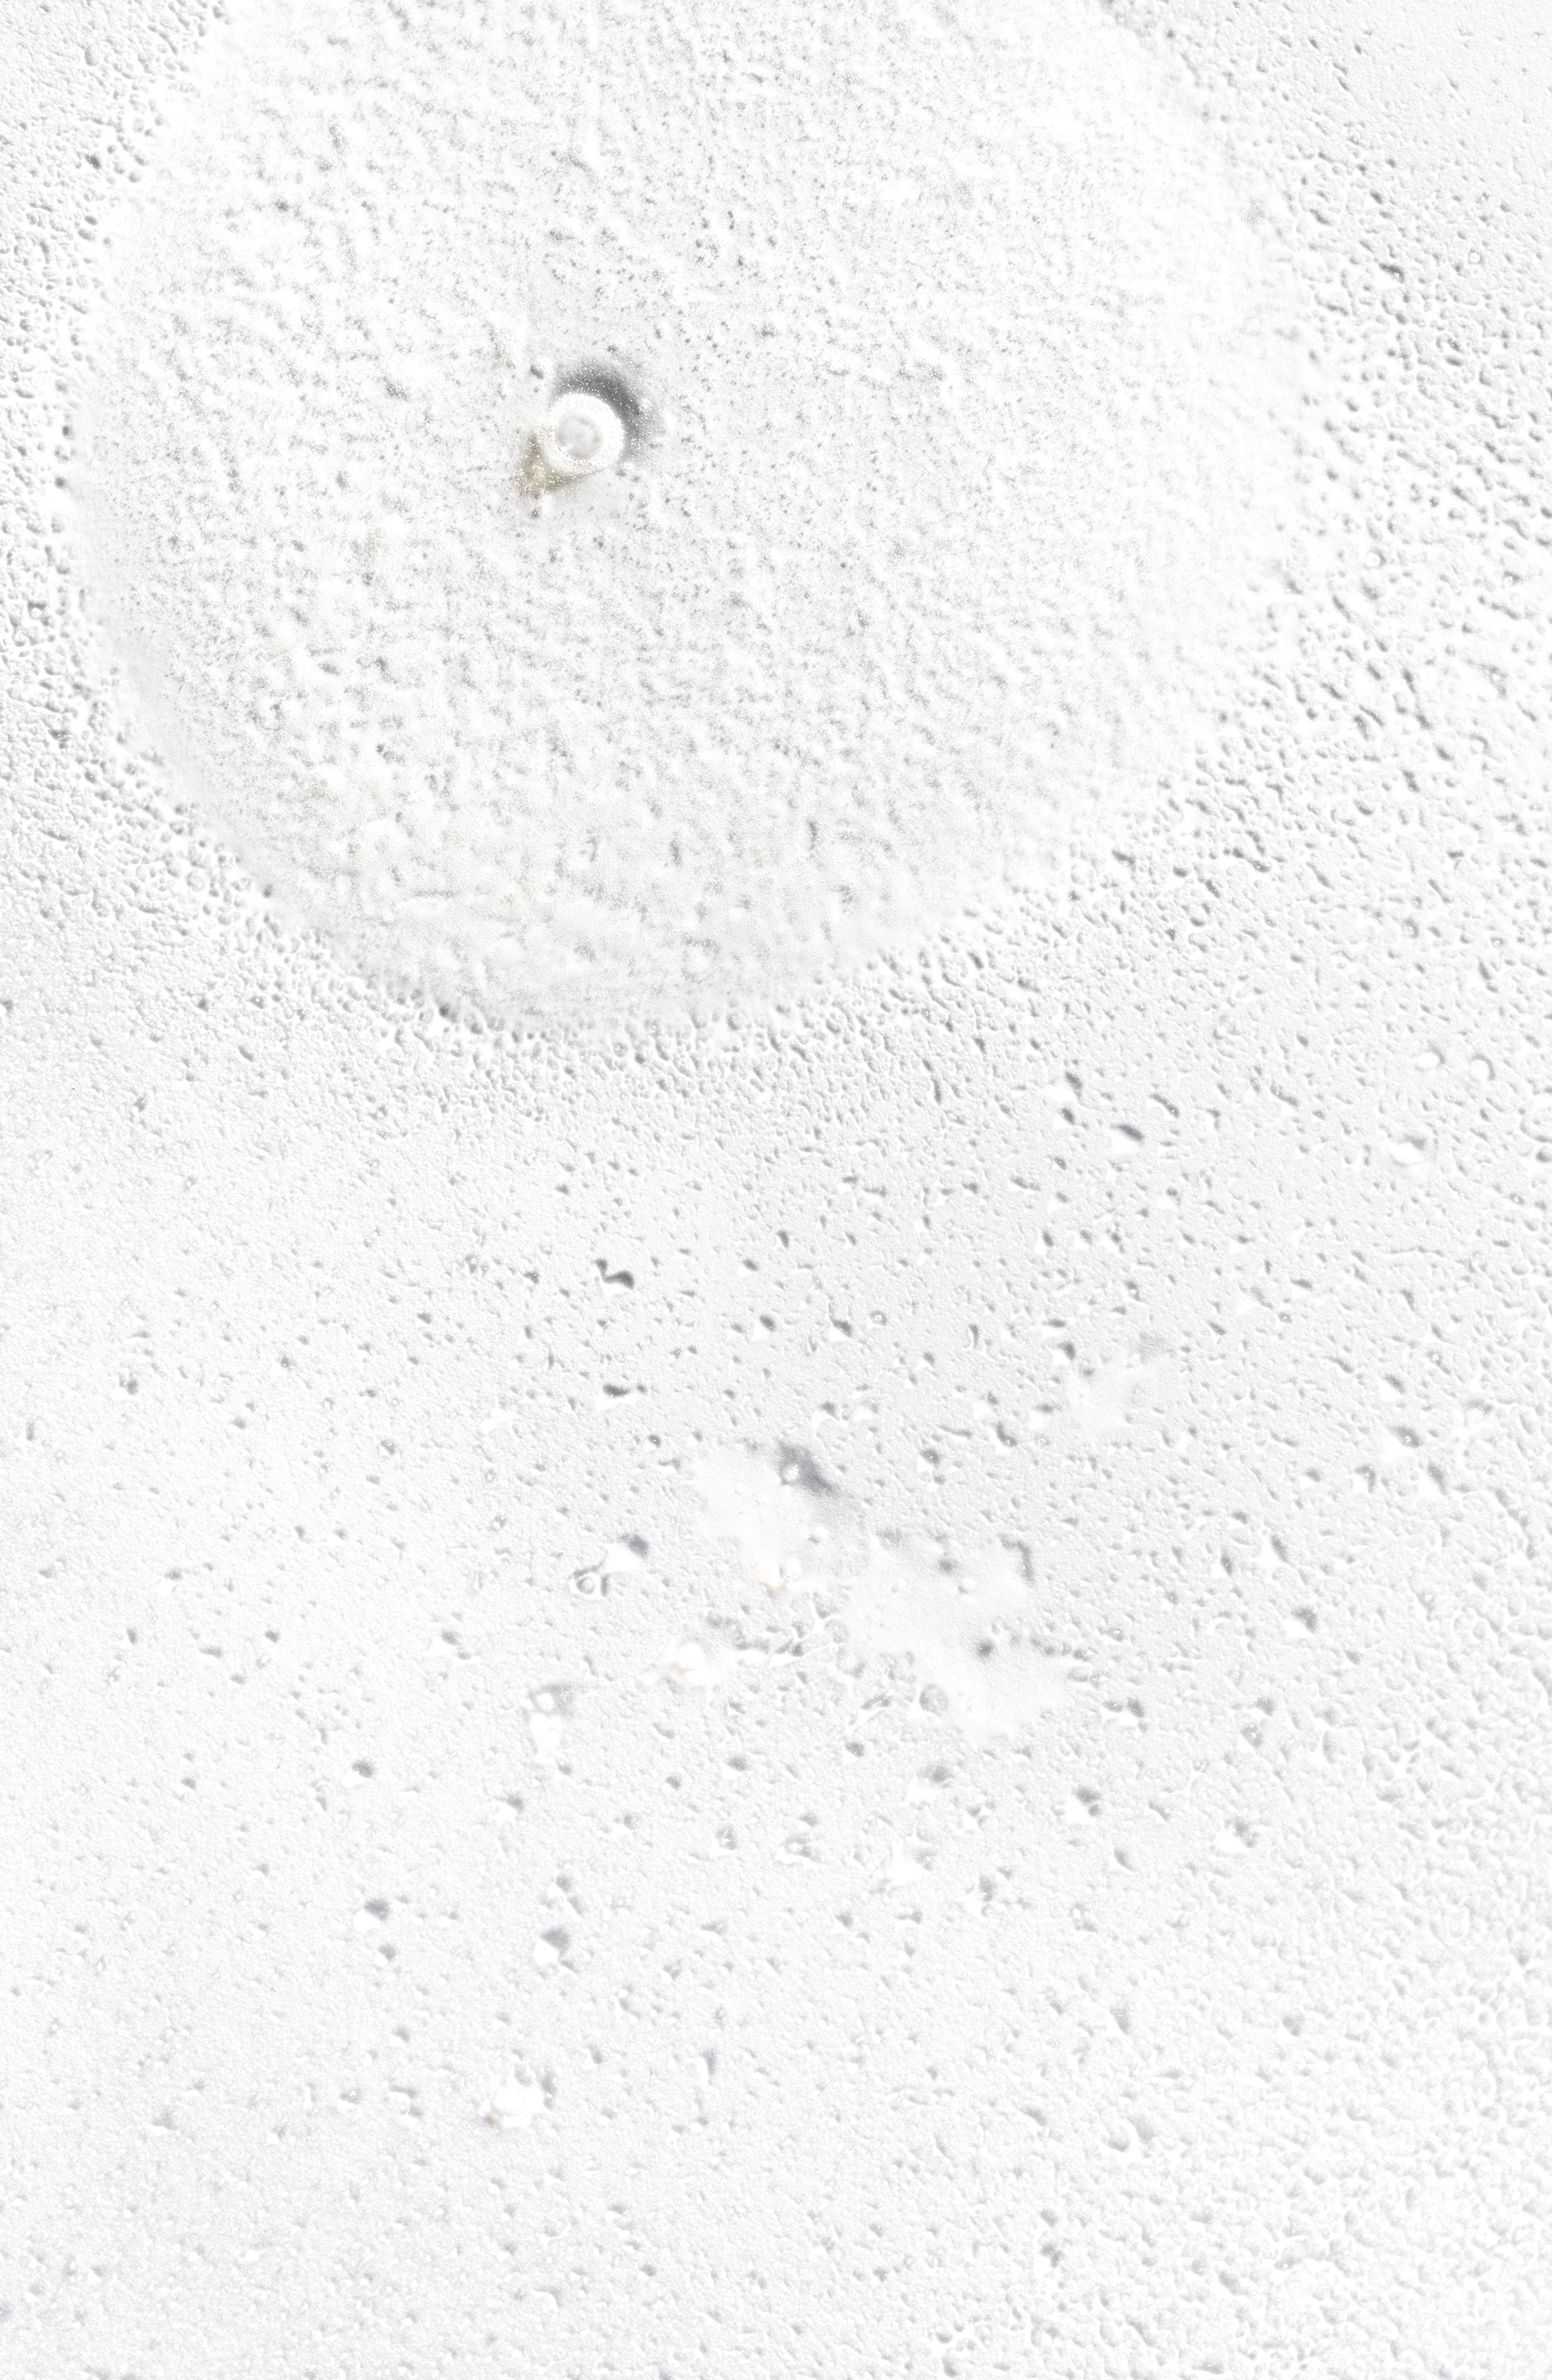 BRIOGEO Stylings BLOSSOM & BLOOM GINSENG + BIOTIN VOLUMIZING SPRAY